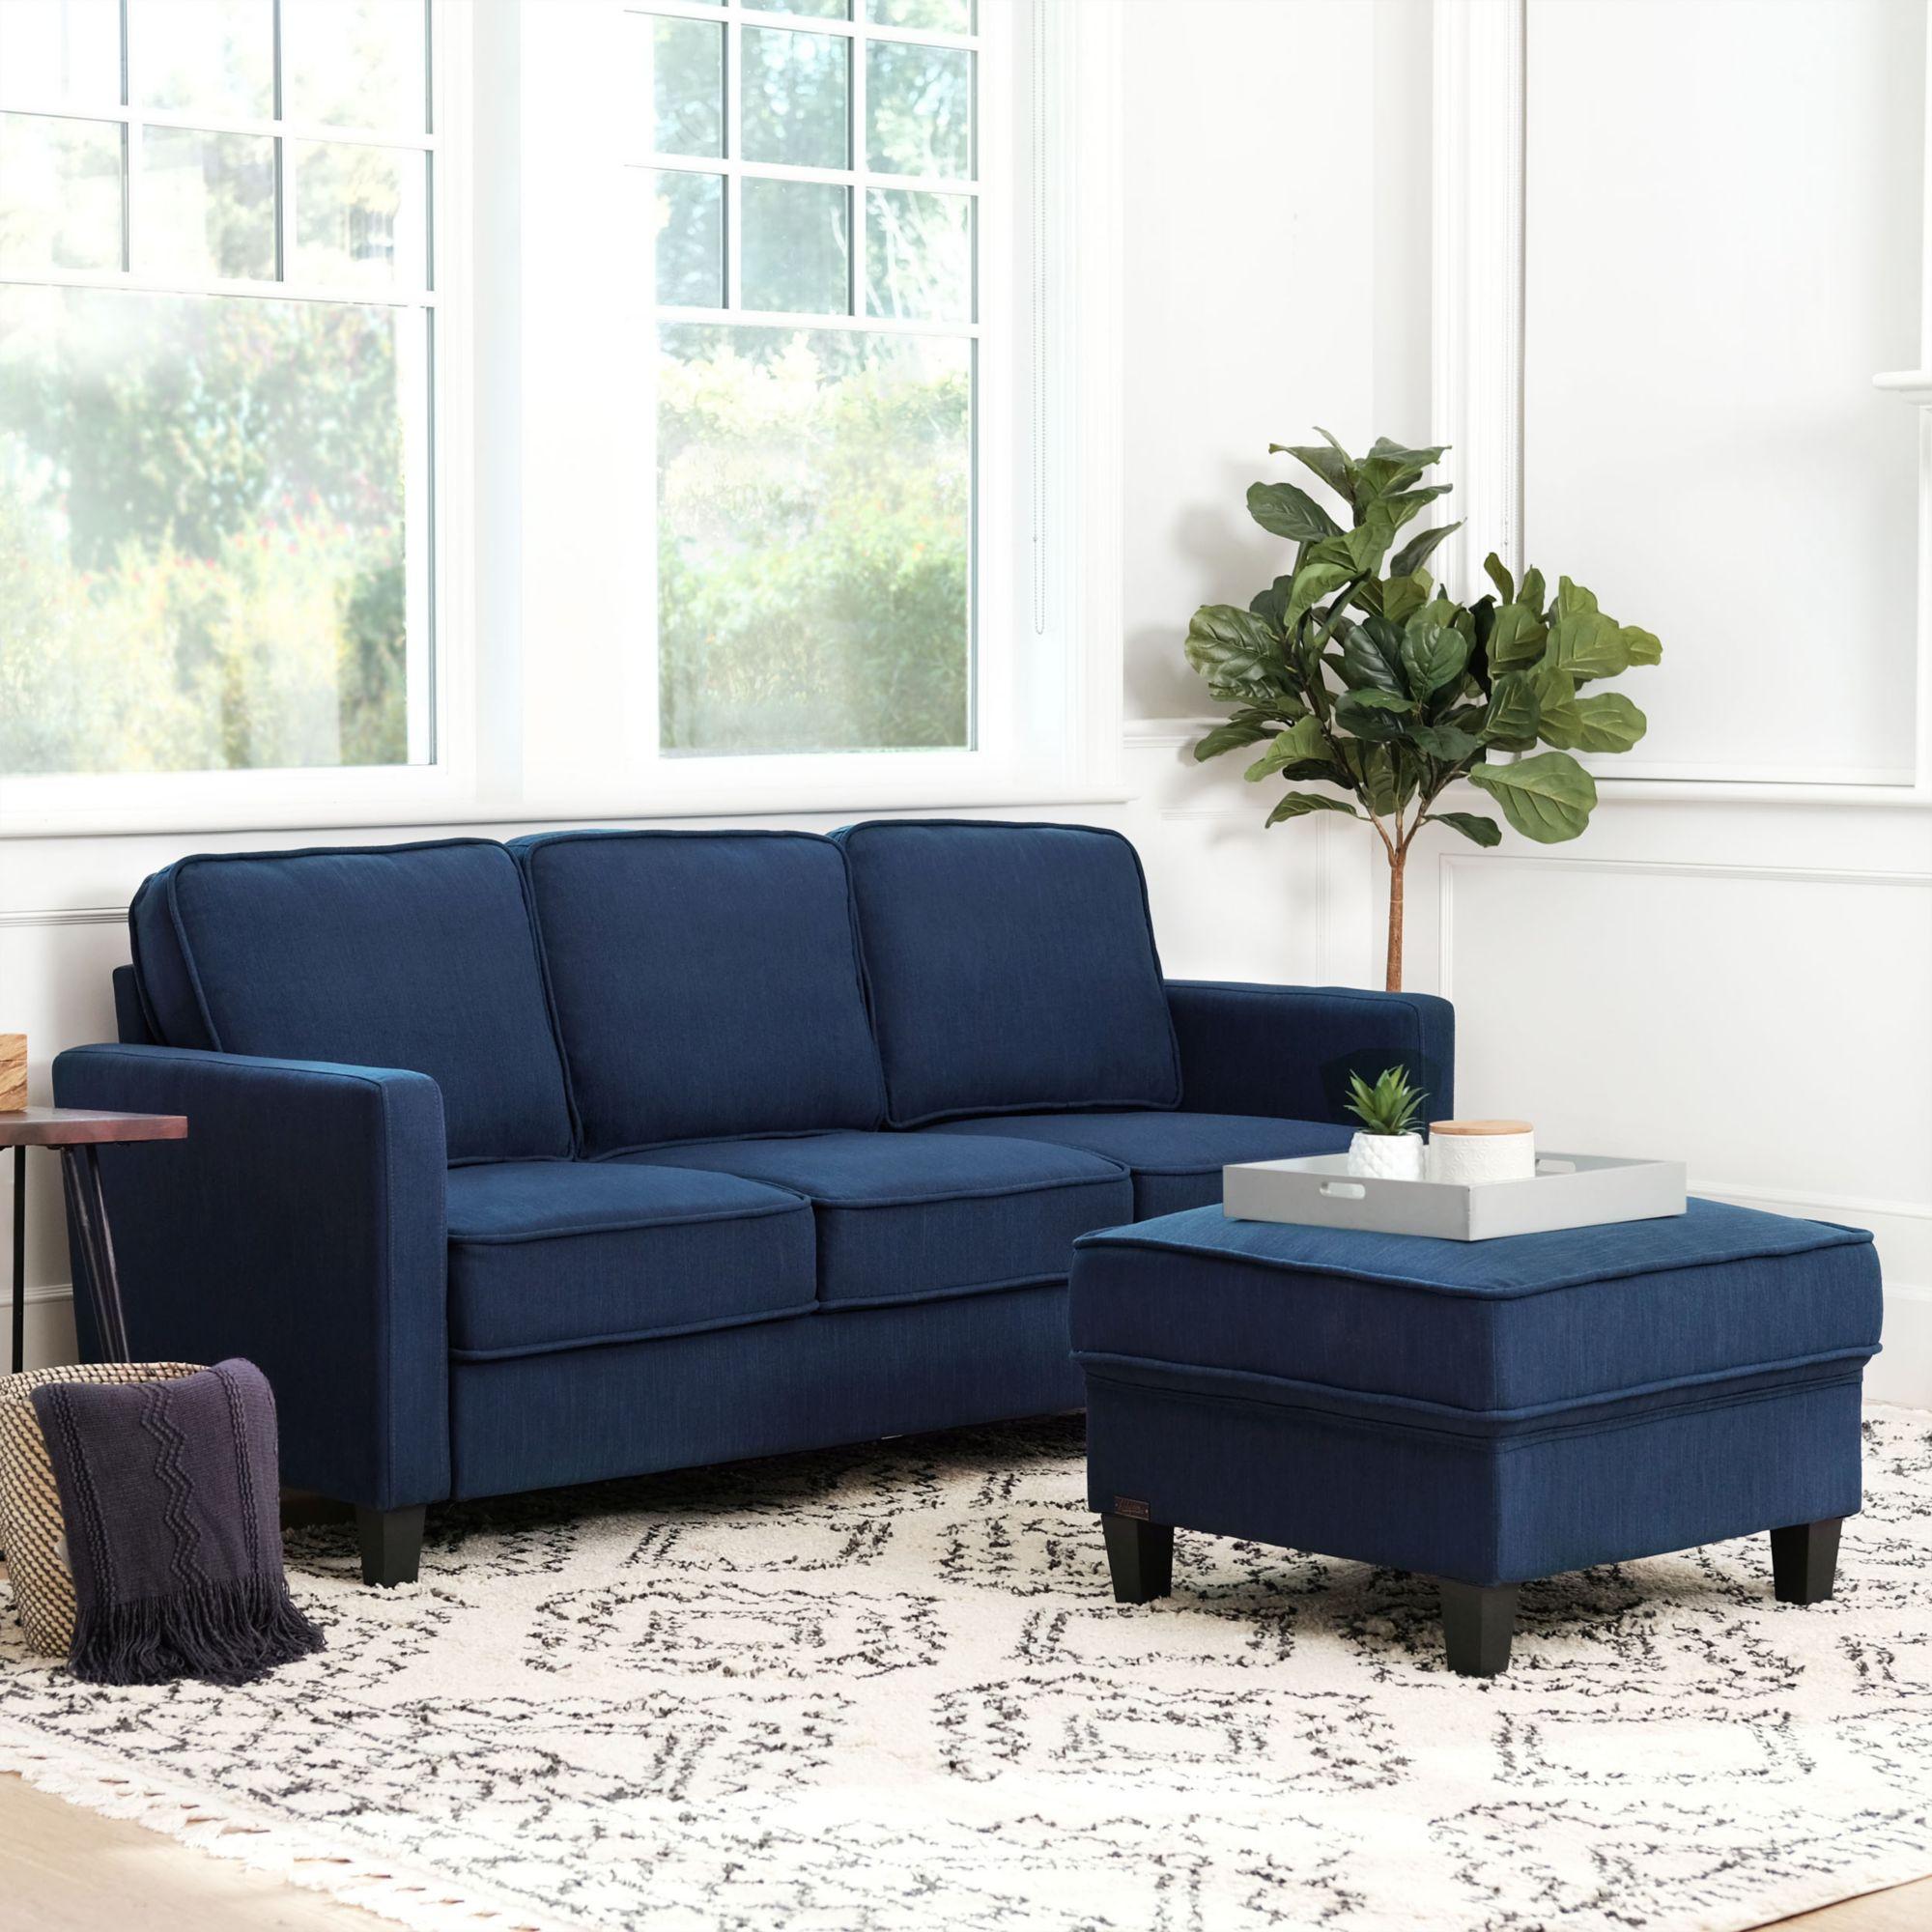 Abbyson Living Madelyn Fabric Sofa Ottoman Set Navy Blue